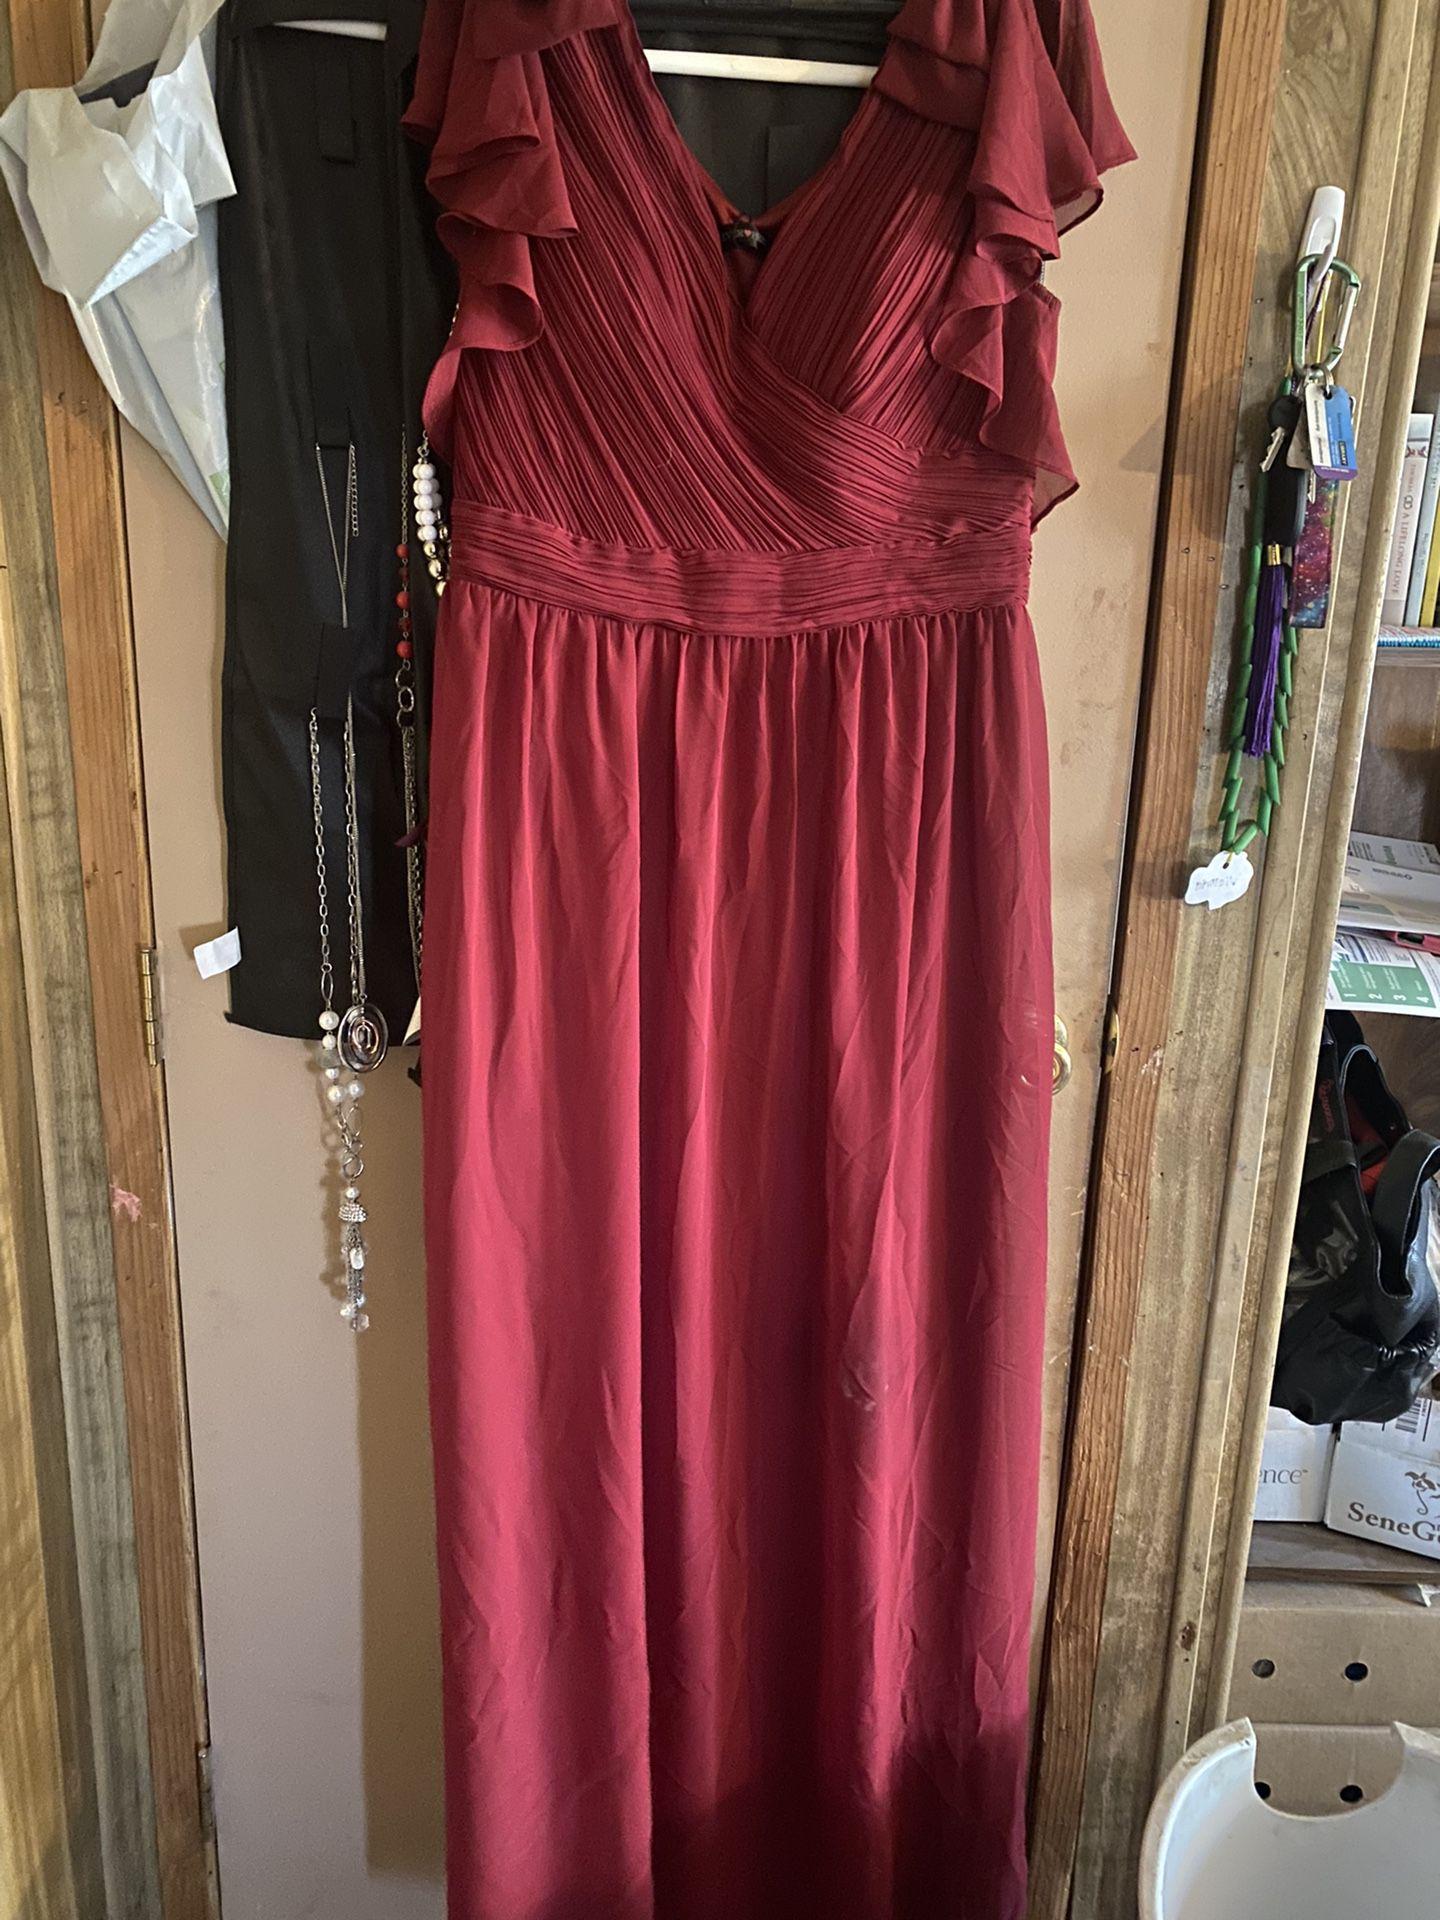 Burgundy Brides Maid Dress